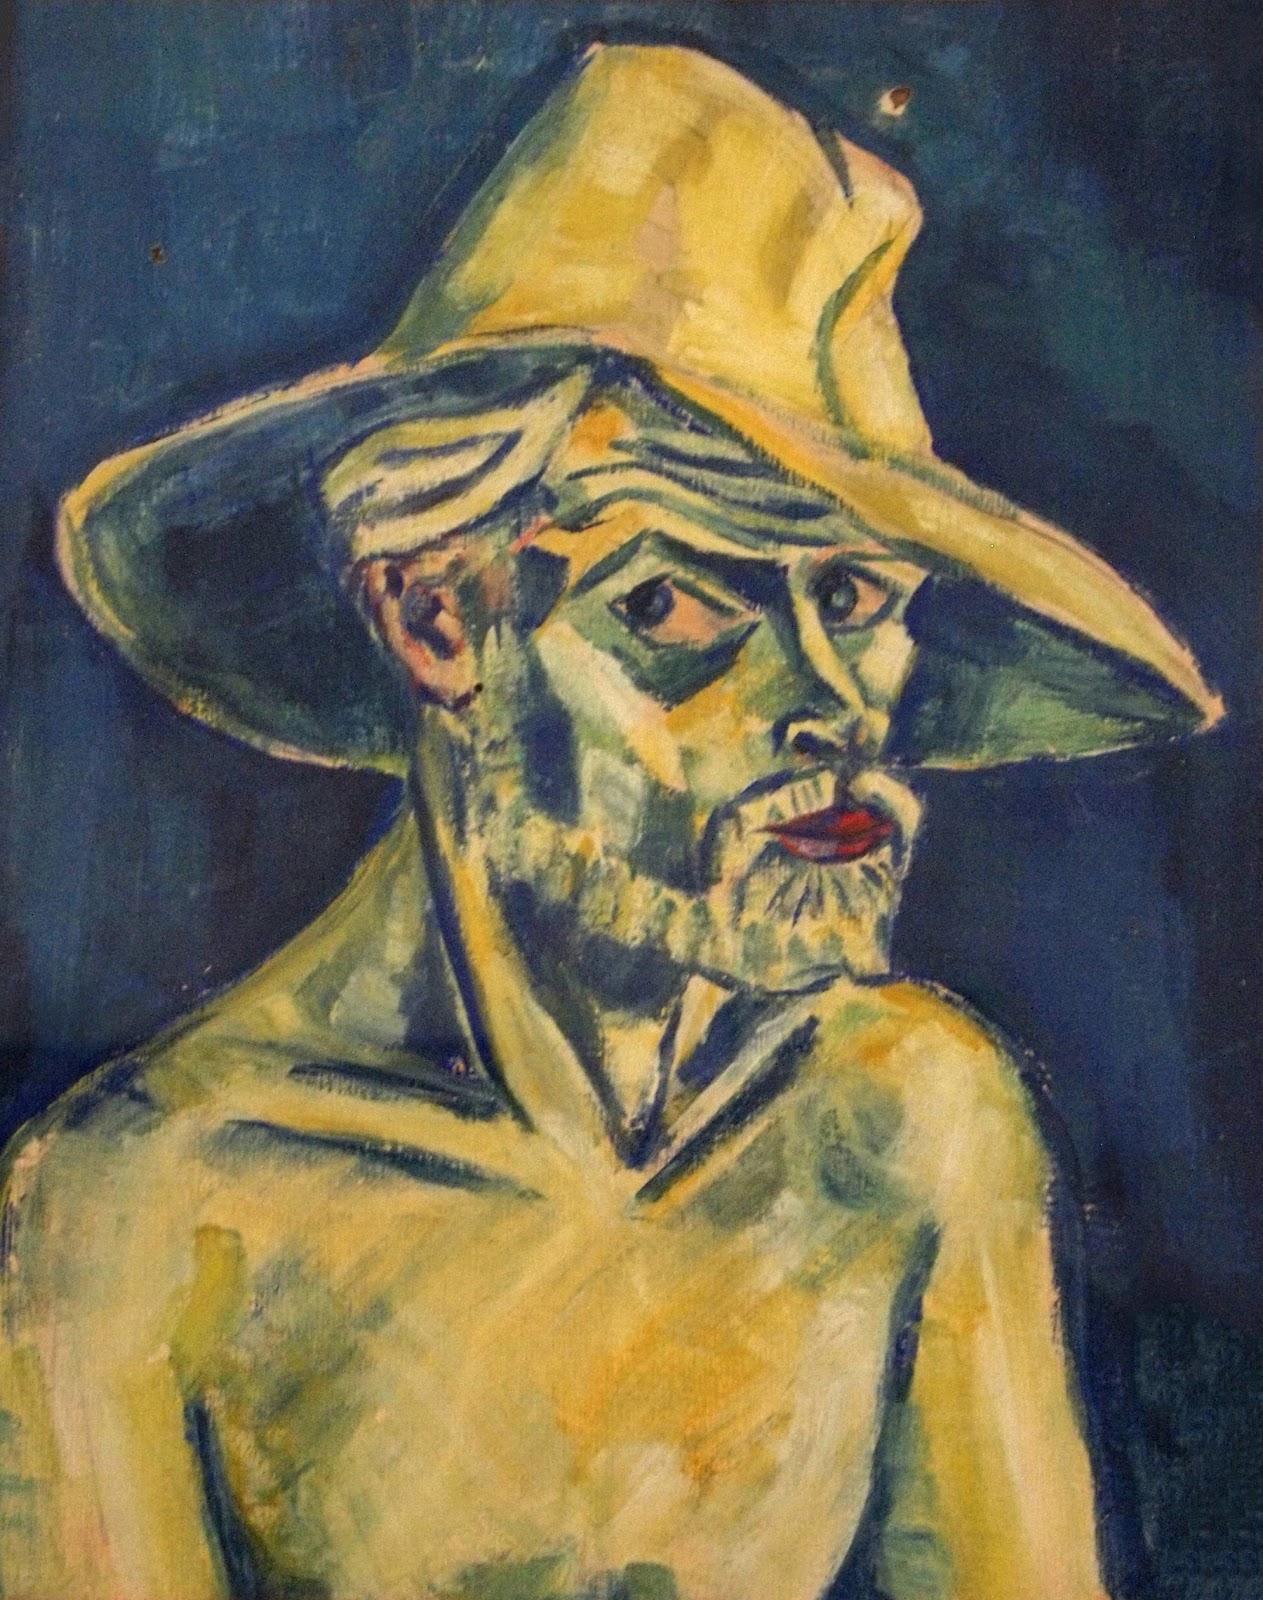 self portrait, undated